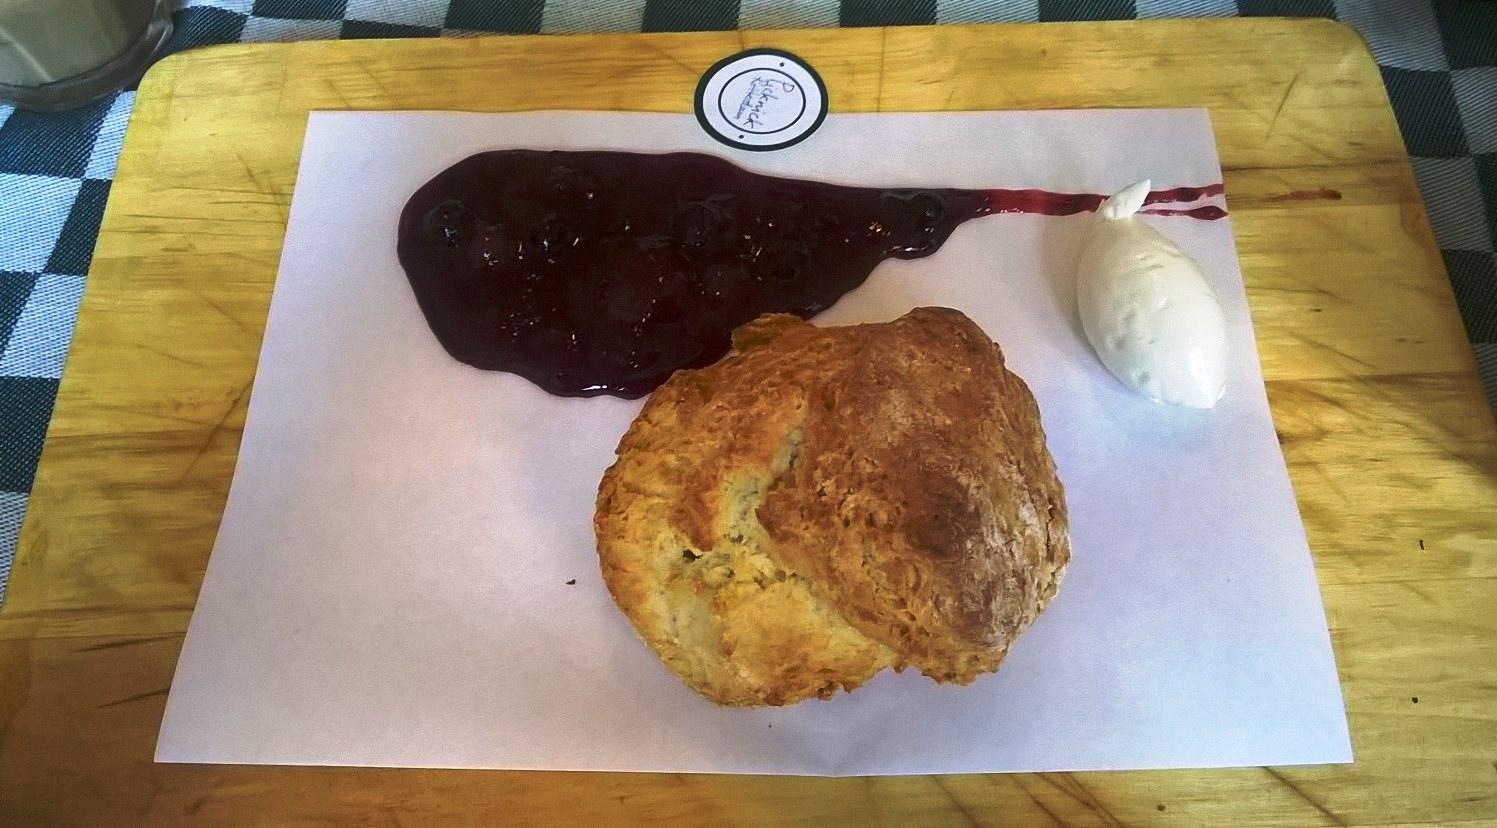 Picknick - scone